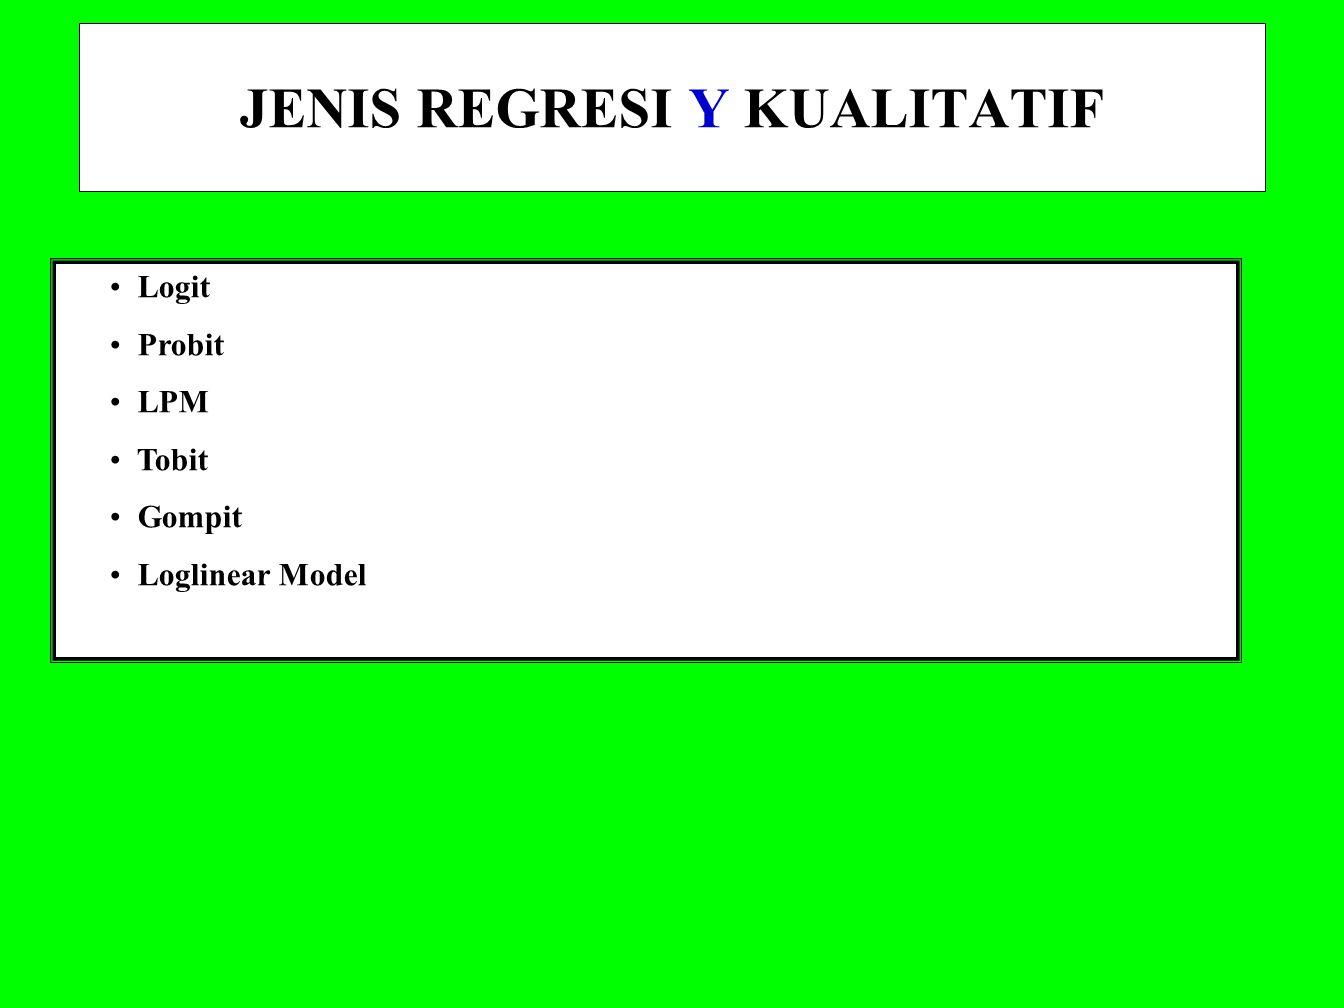 JENIS REGRESI Y KUALITATIF Logit Probit LPM Tobit Gompit Loglinear Model